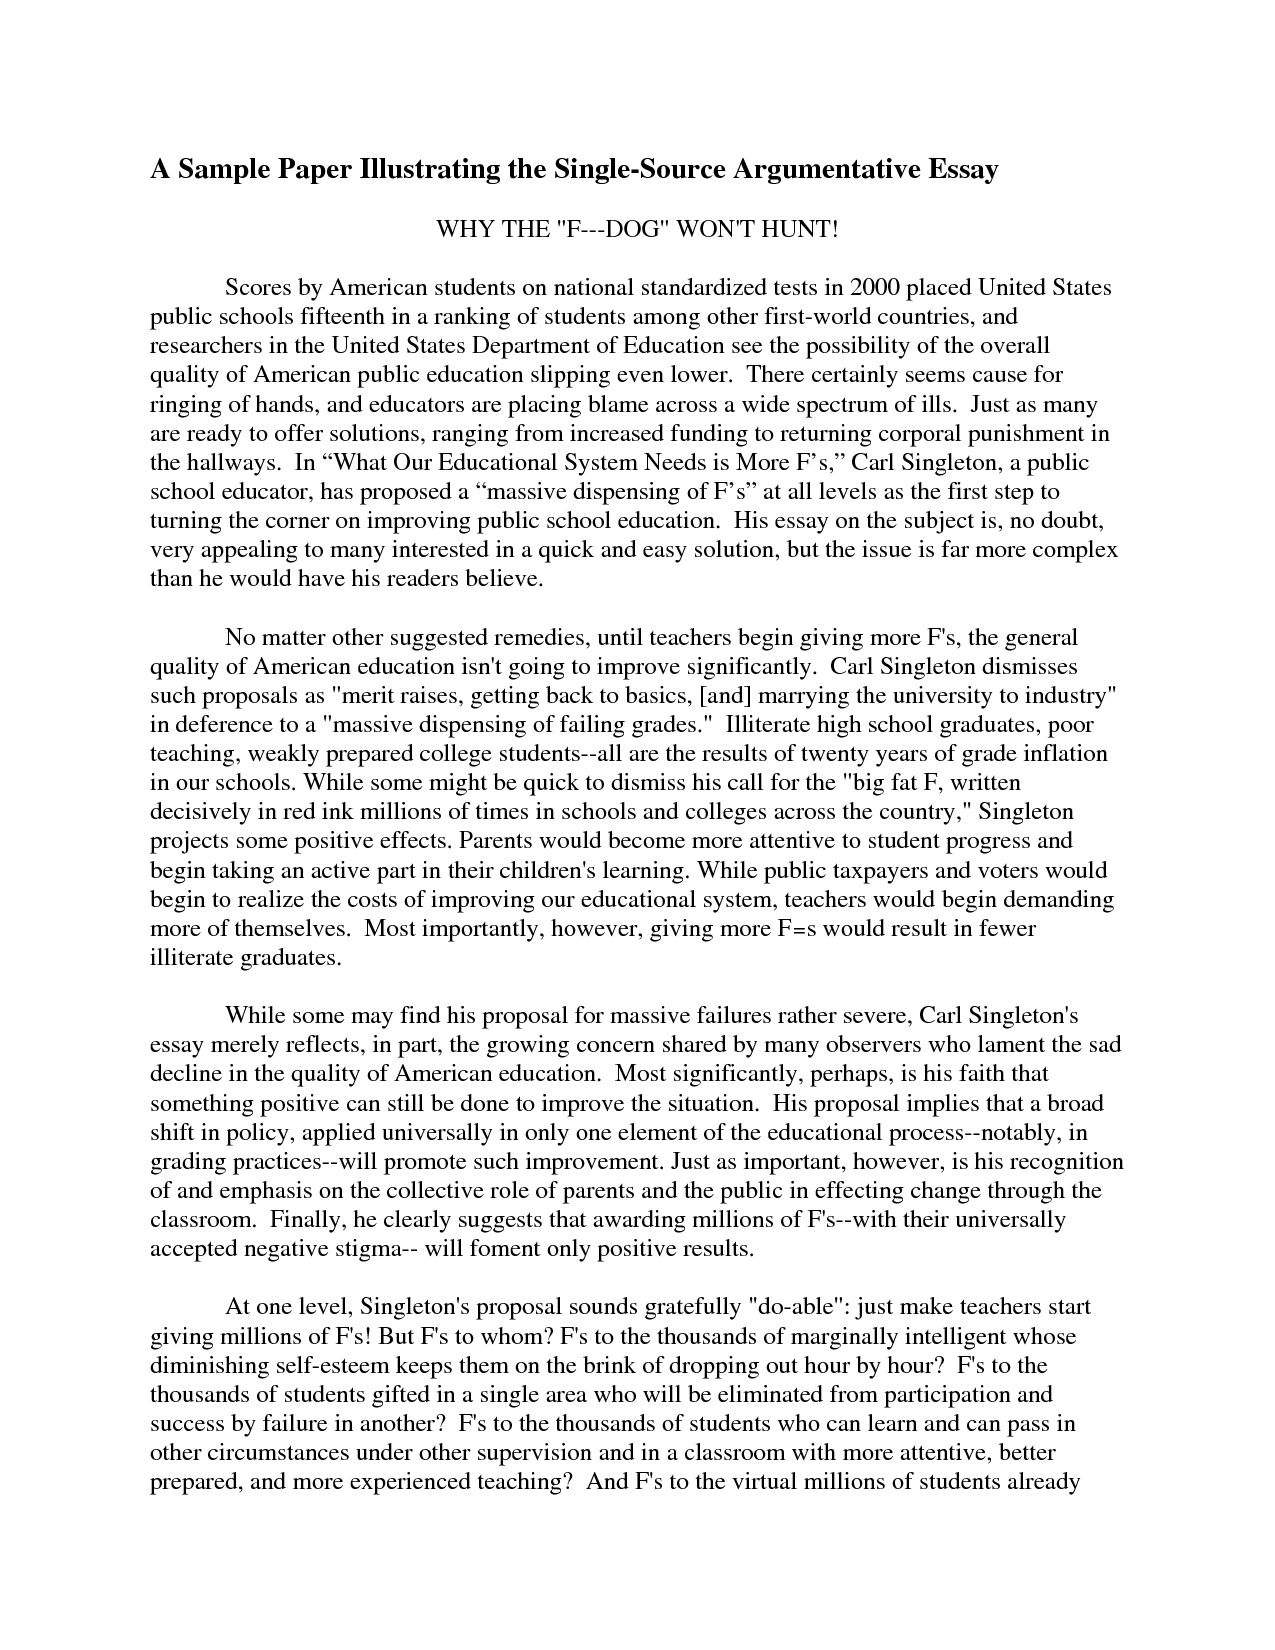 005 Argumentative Essay Sample Fyvb2pmxix Dreaded Template College Middle School Persuasive Writing Grade 7 Full